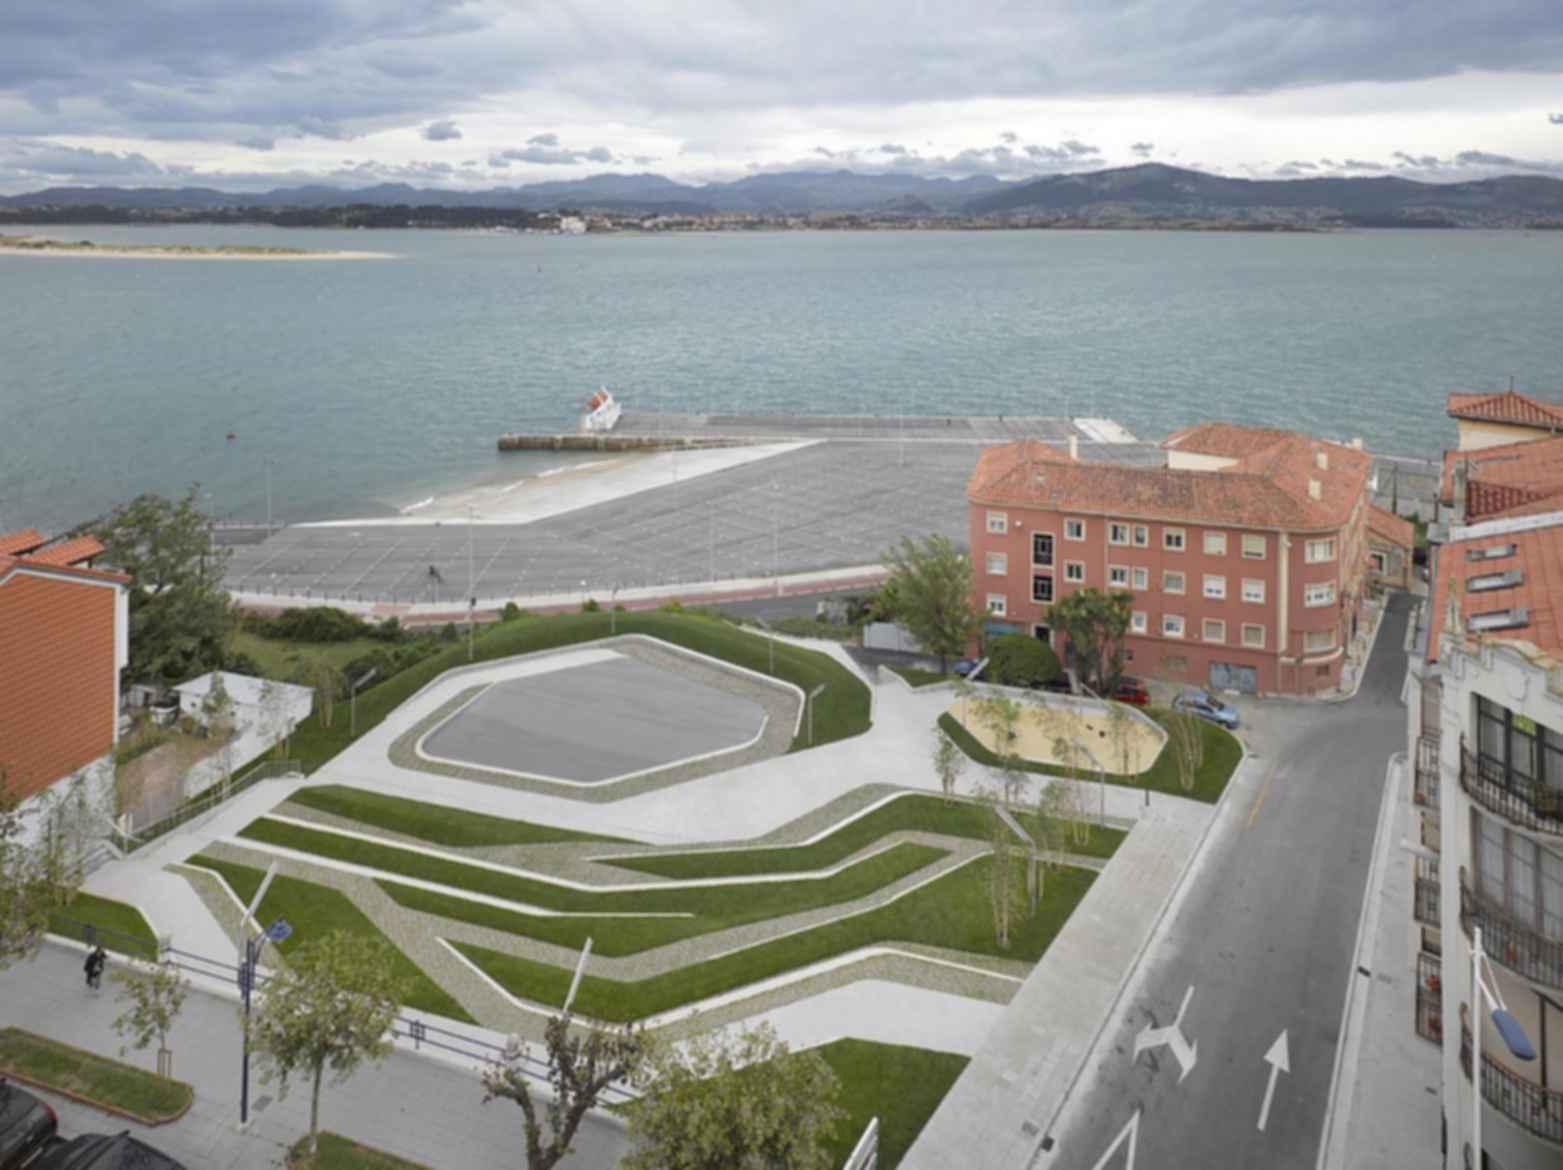 San Martin de la Mar Square